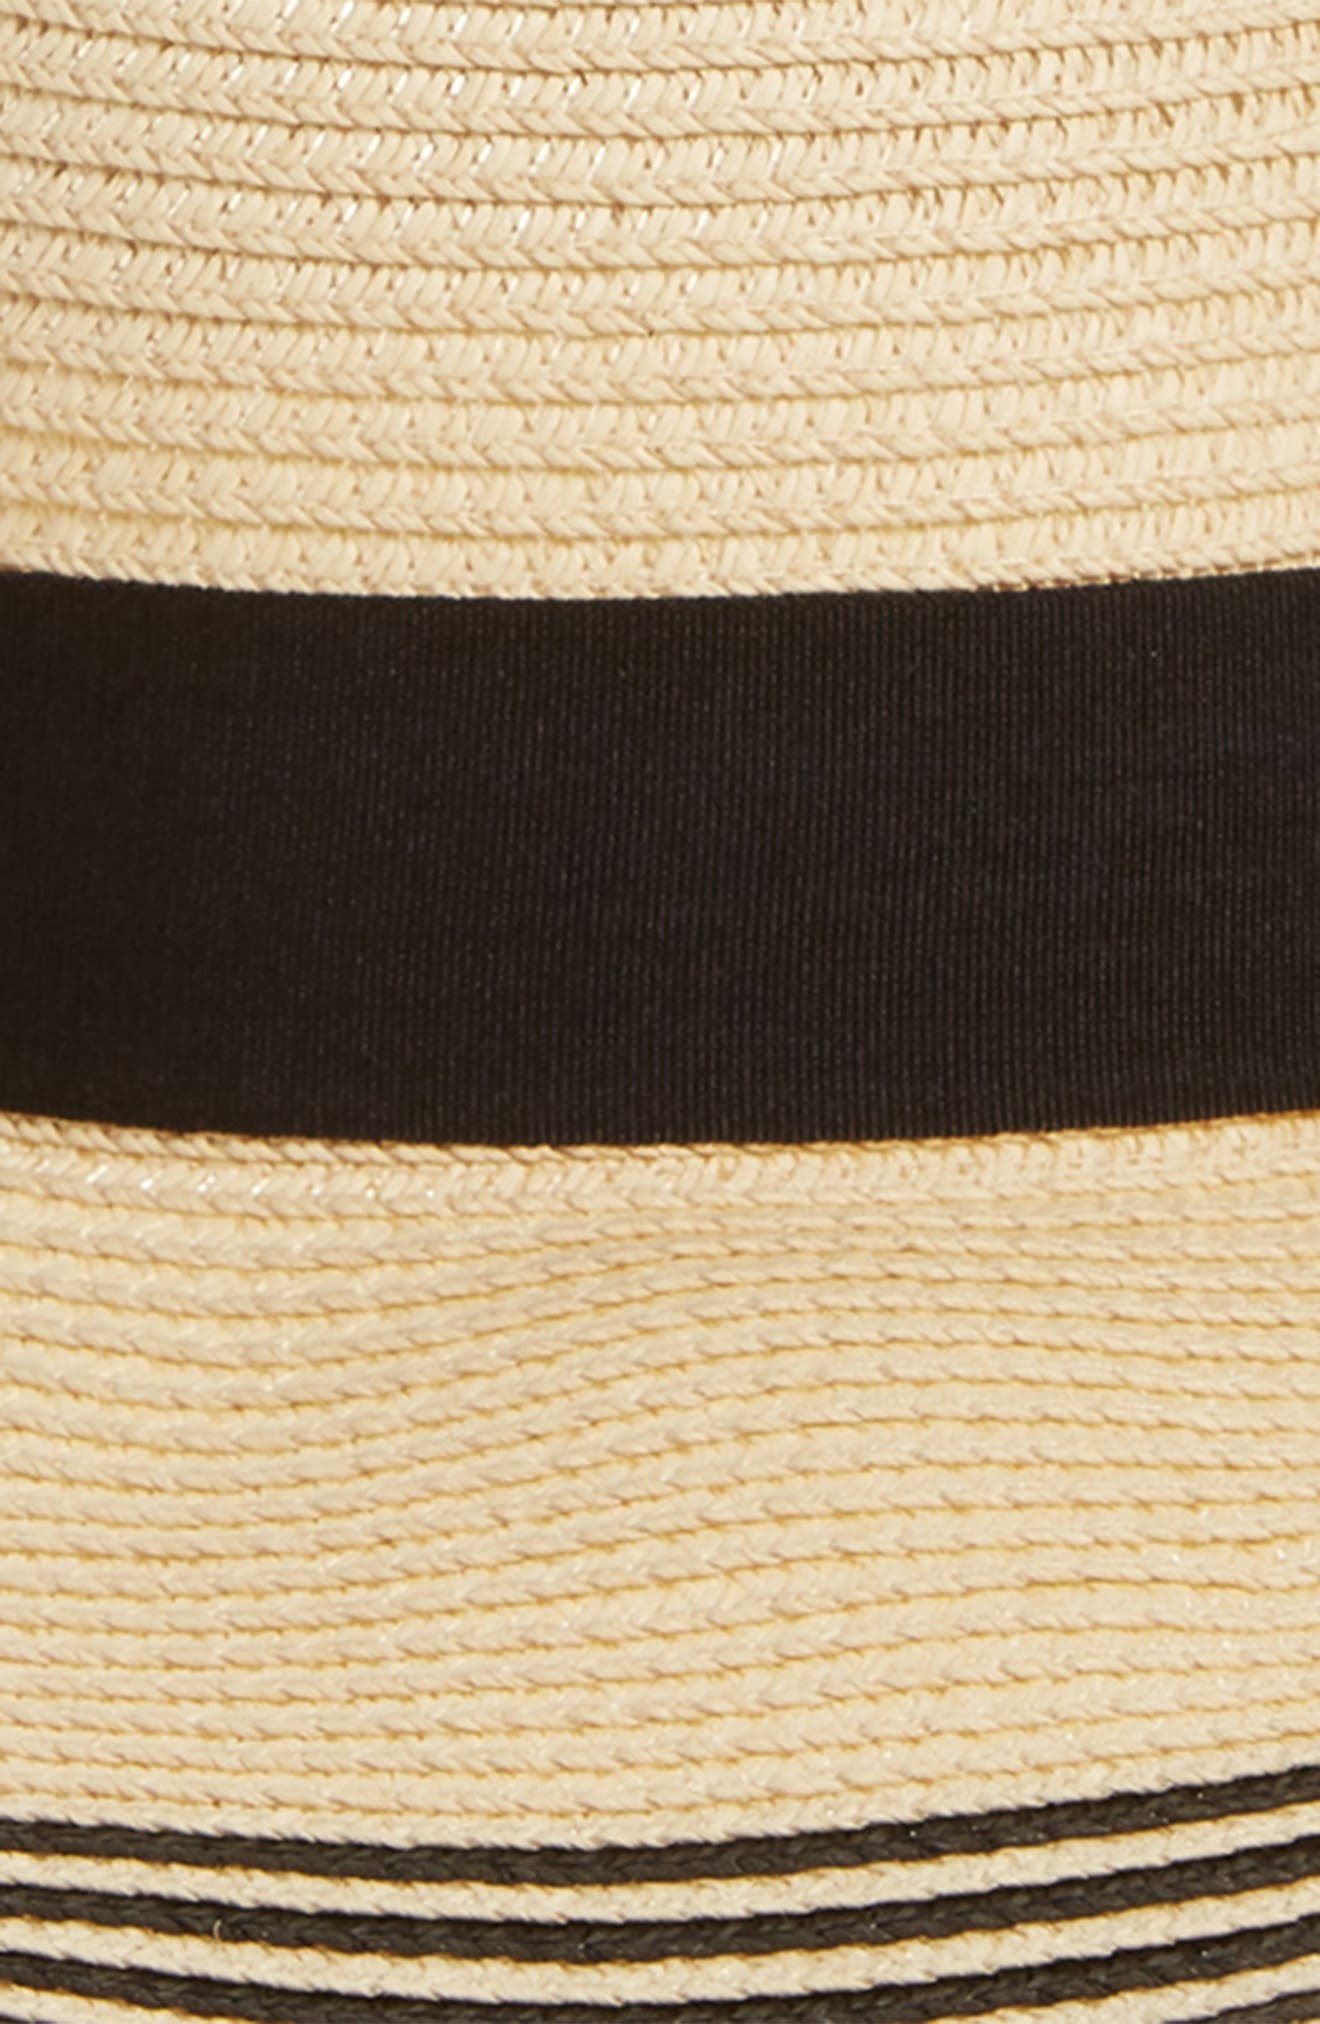 Stripe Brim Straw Hat,                             Alternate thumbnail 2, color,                             Natural/ Black